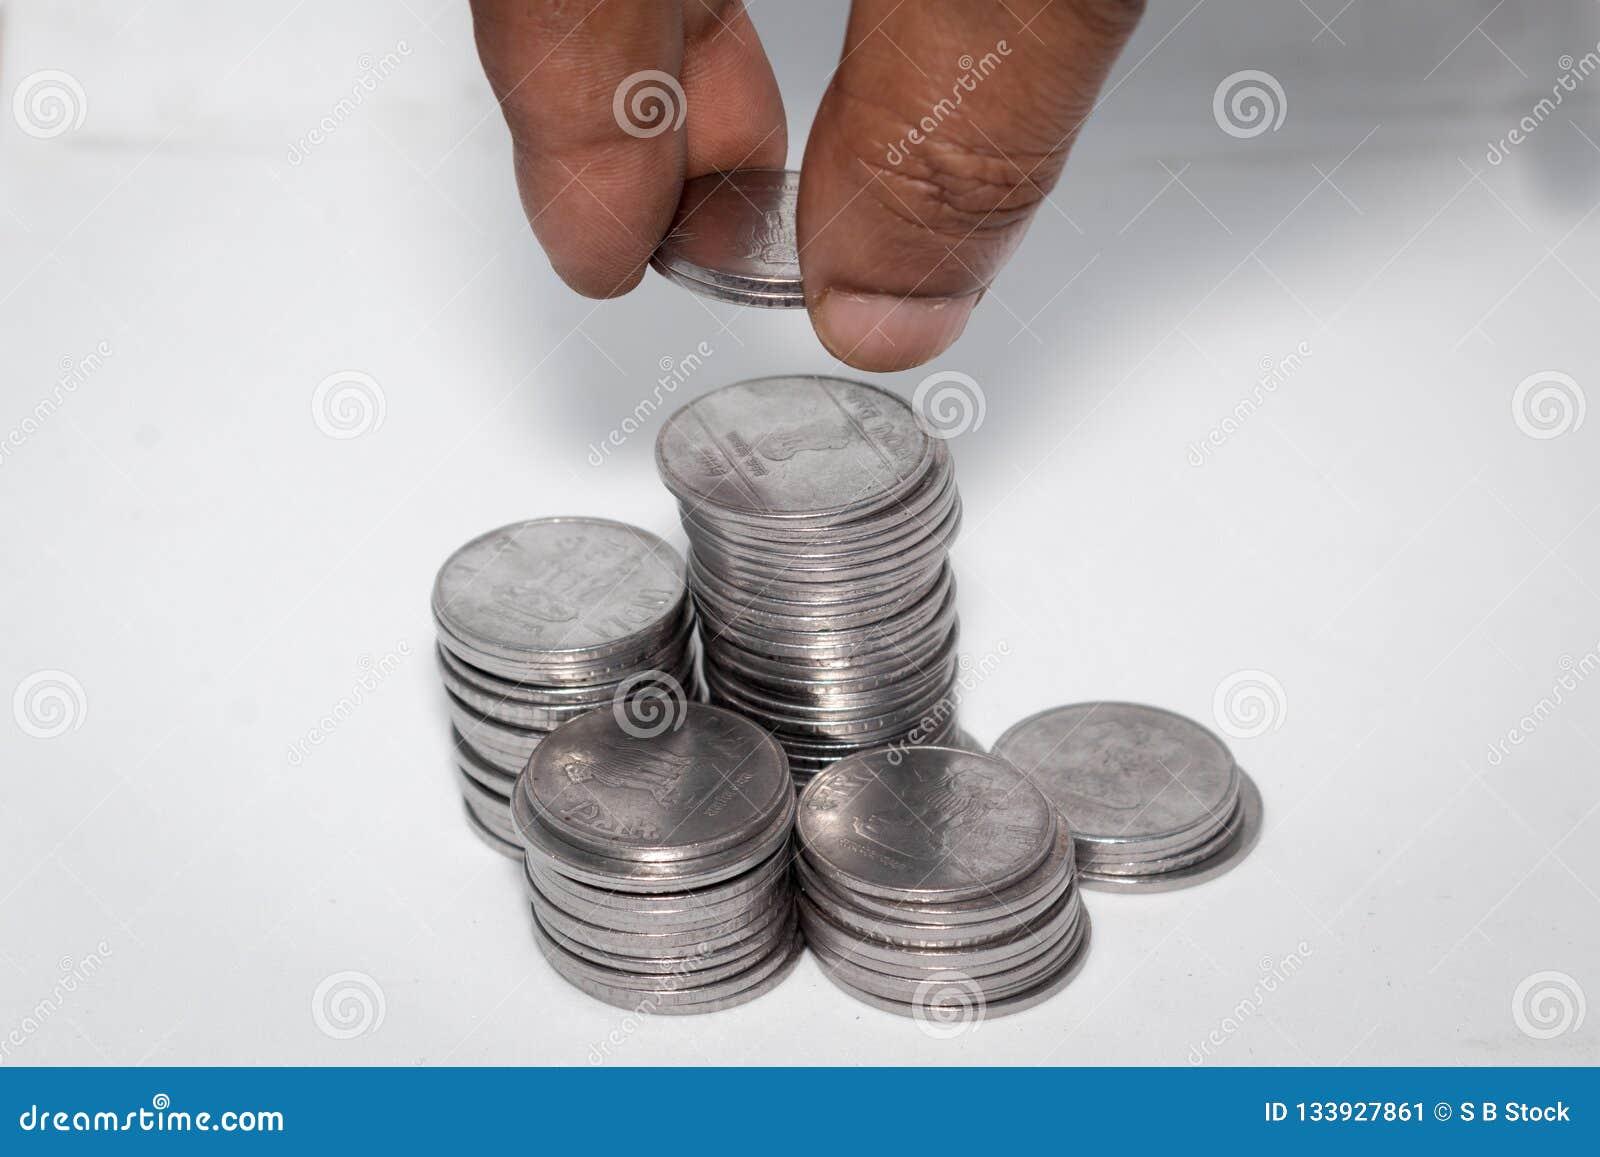 Бизнесмен кладя монетки над стогом монеток Концепция финансовых, экономики, вклада и сбережений Объект банка и обмена